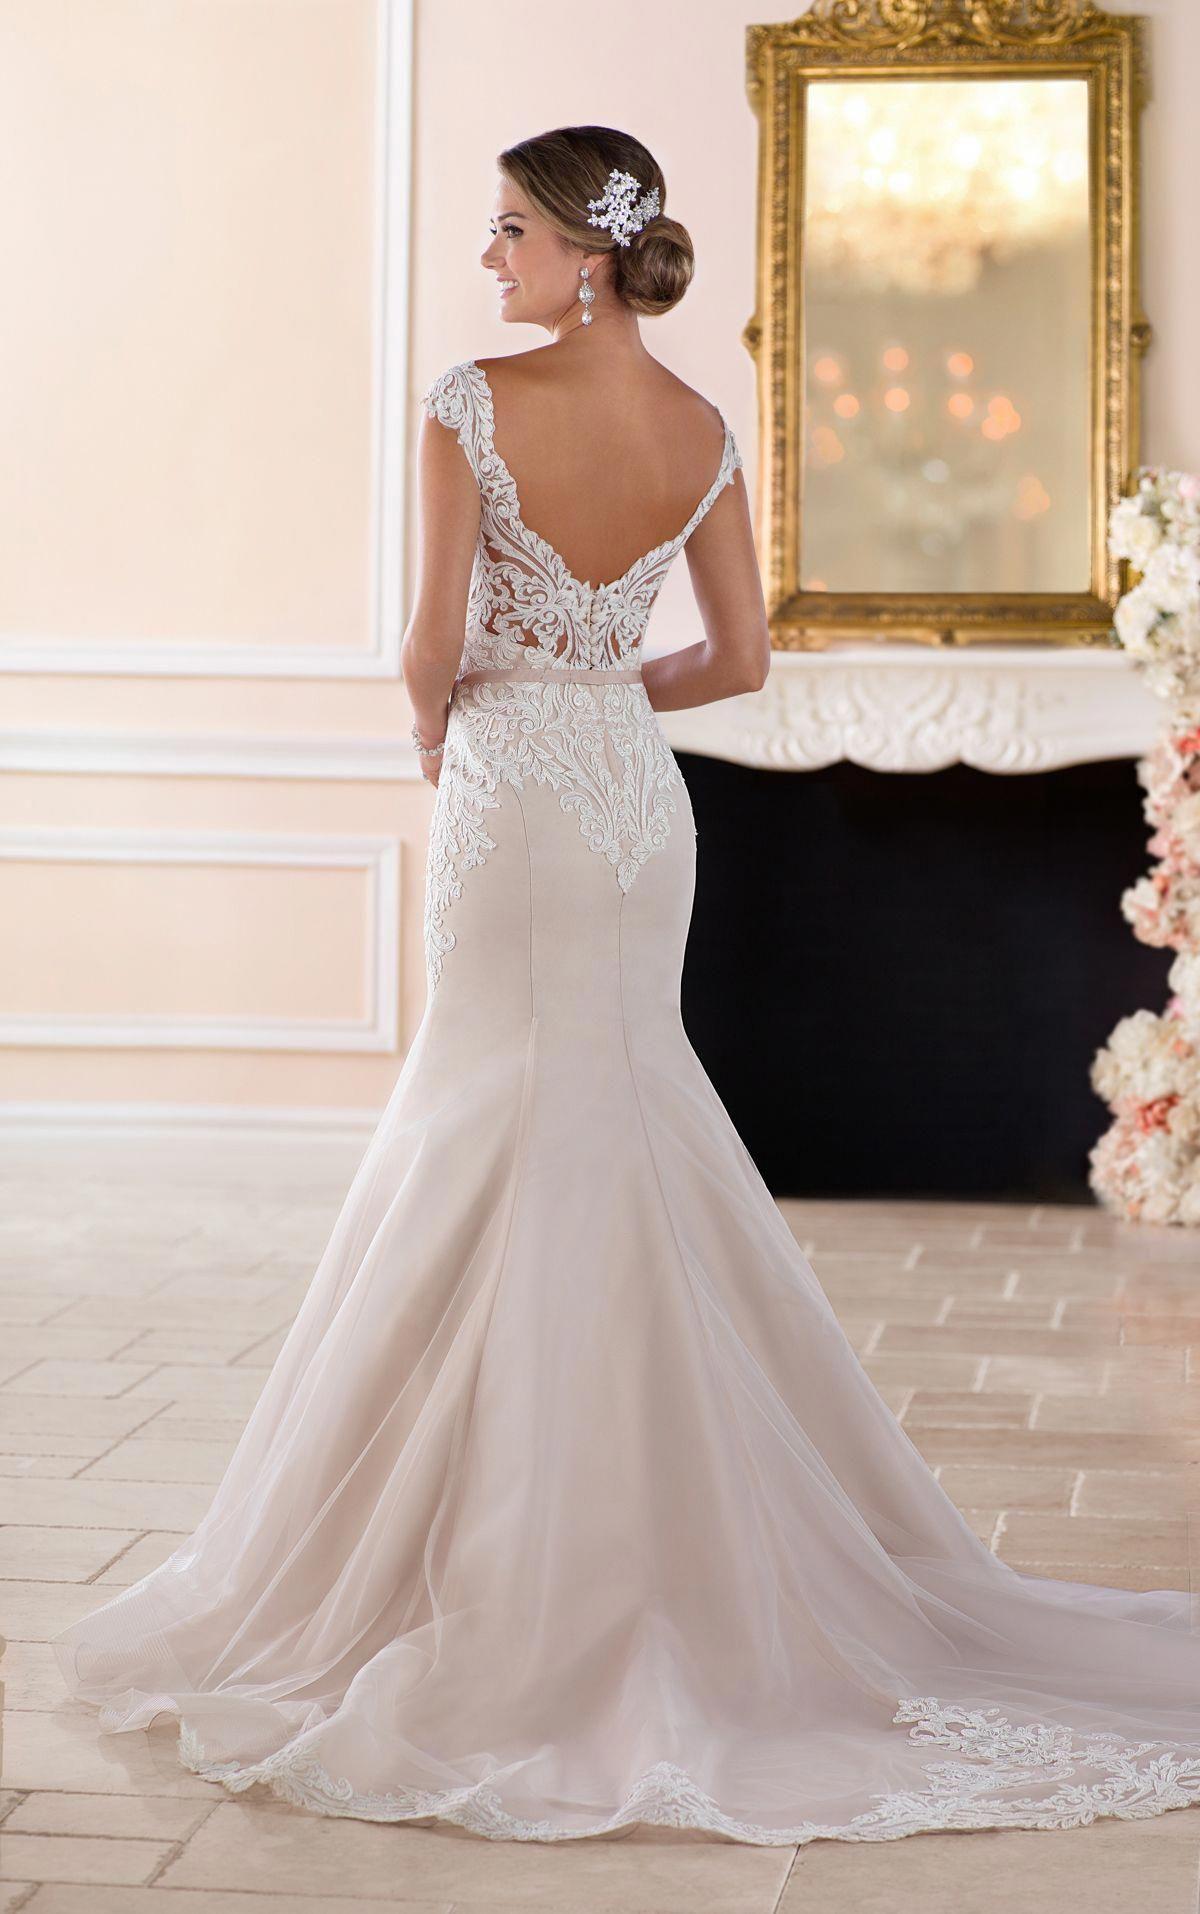 Women's Double Vneck Sleeveless Lace Wedding Dress